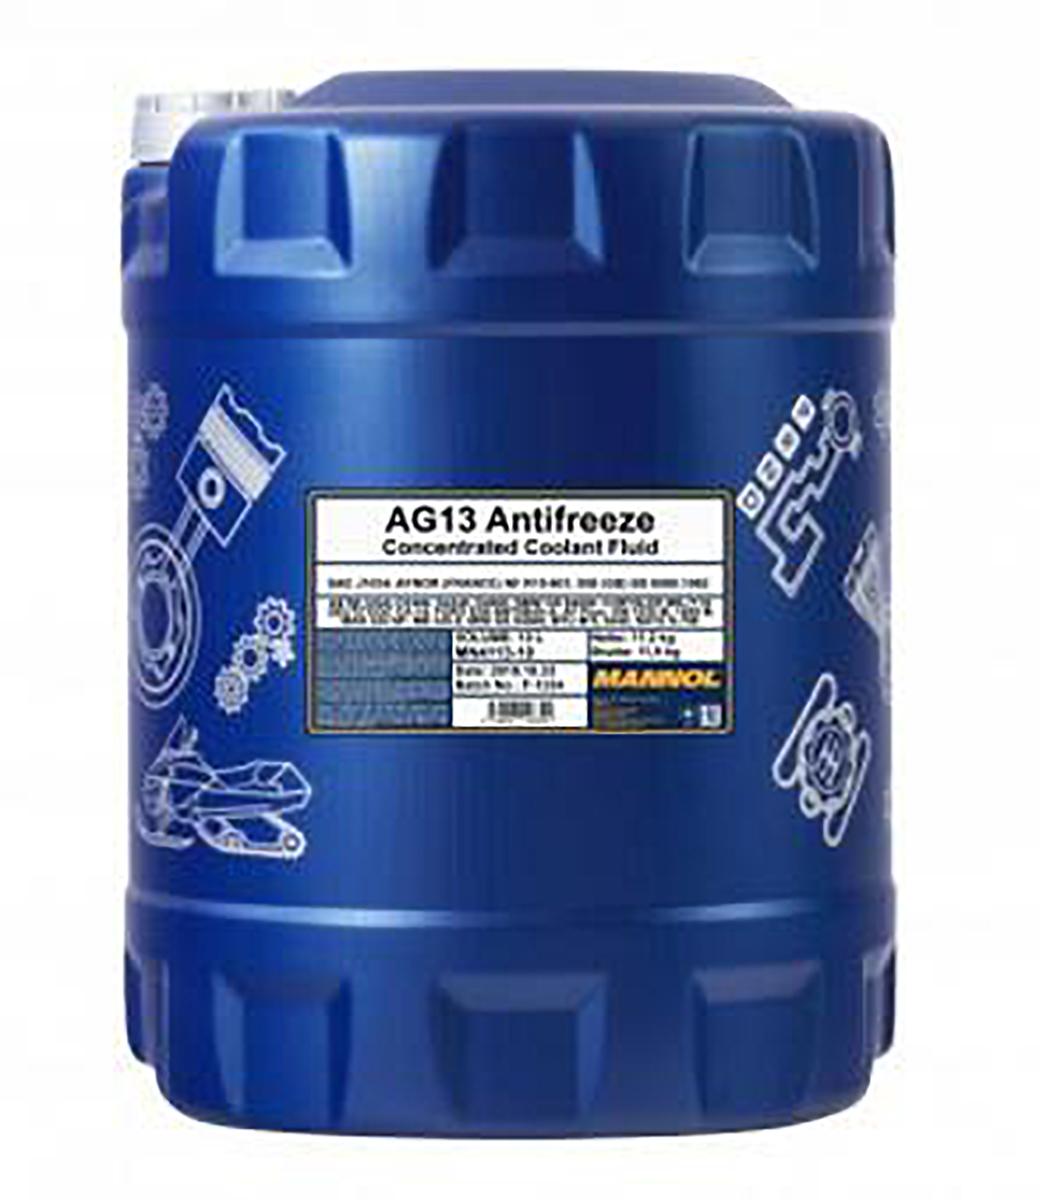 Antifreeze AG13 Hightec